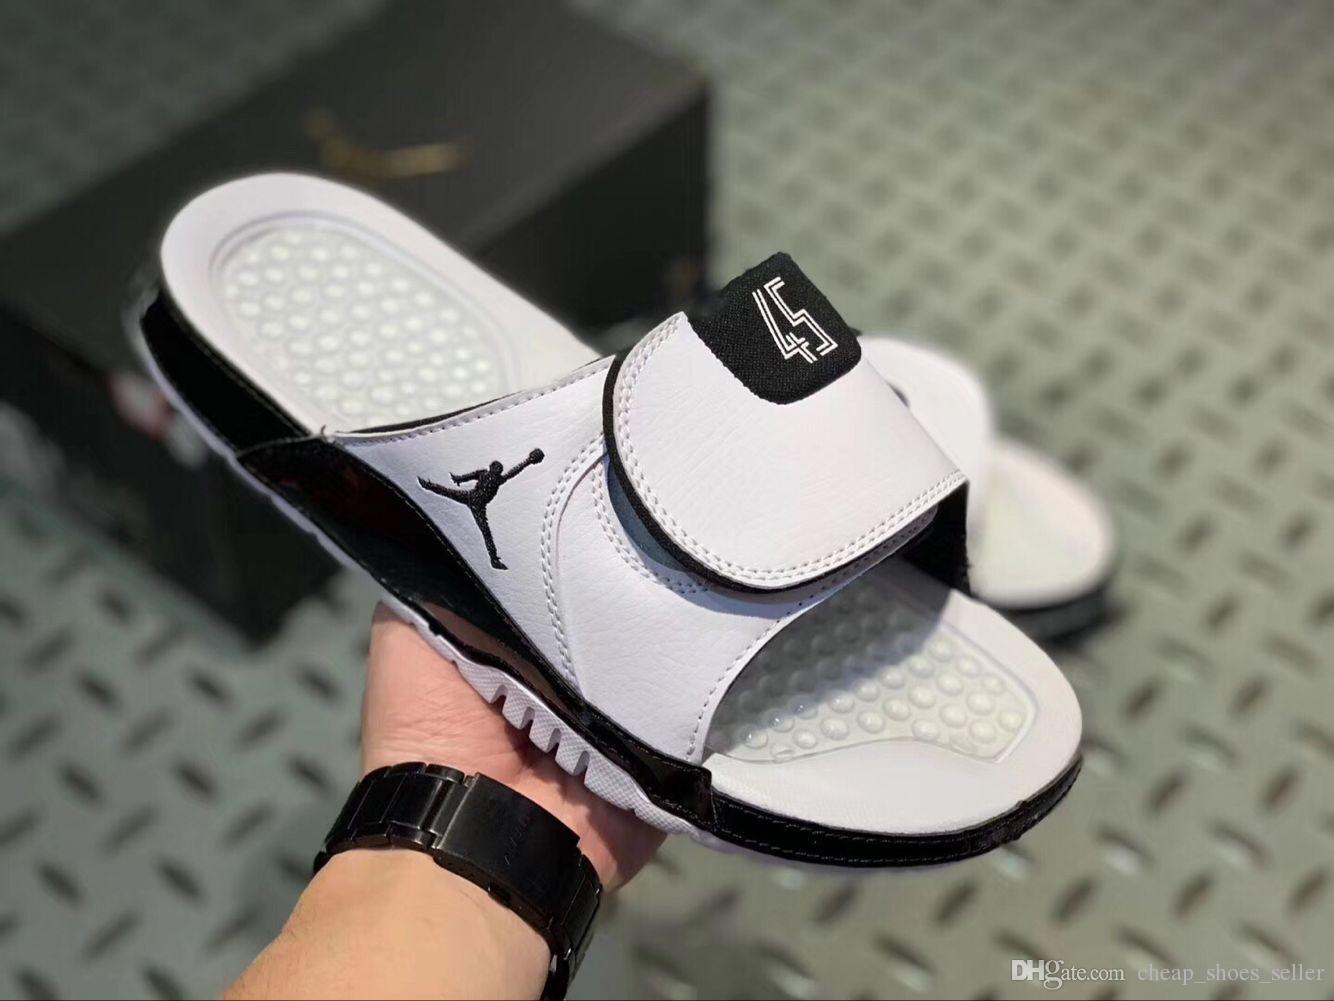 competitive price 8cfe6 ae3bd Jumpman Concord 45 11 designer sandals Mens 13s slides HYDRO Summer Flat  Basketball Shoes White black RETRO women Beach Slipper Flip Flop